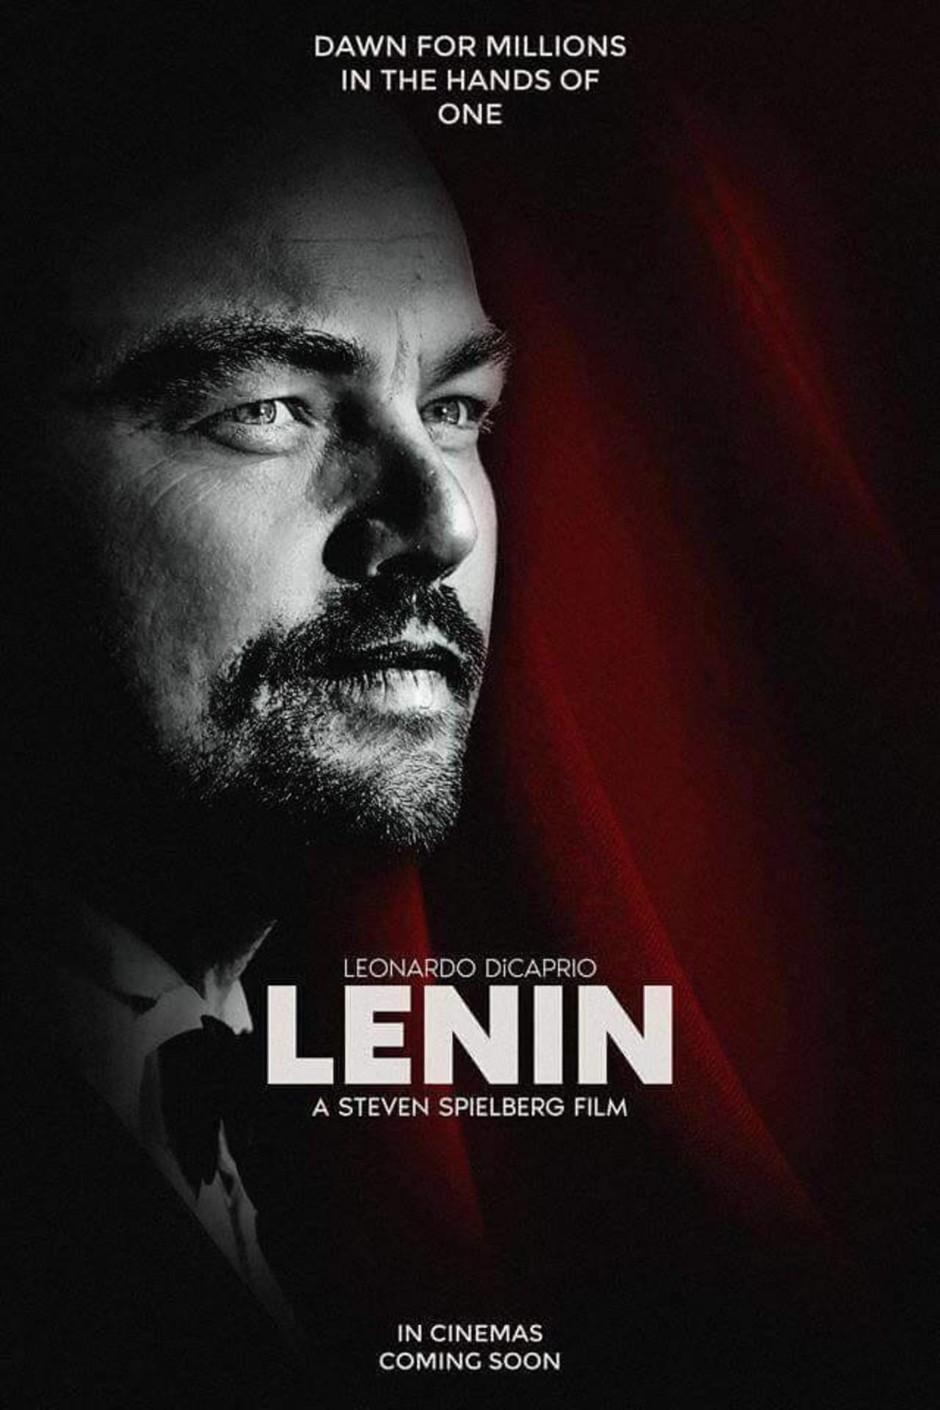 А все же знают про биографический фильм про Ленина, с Ди Каприо?